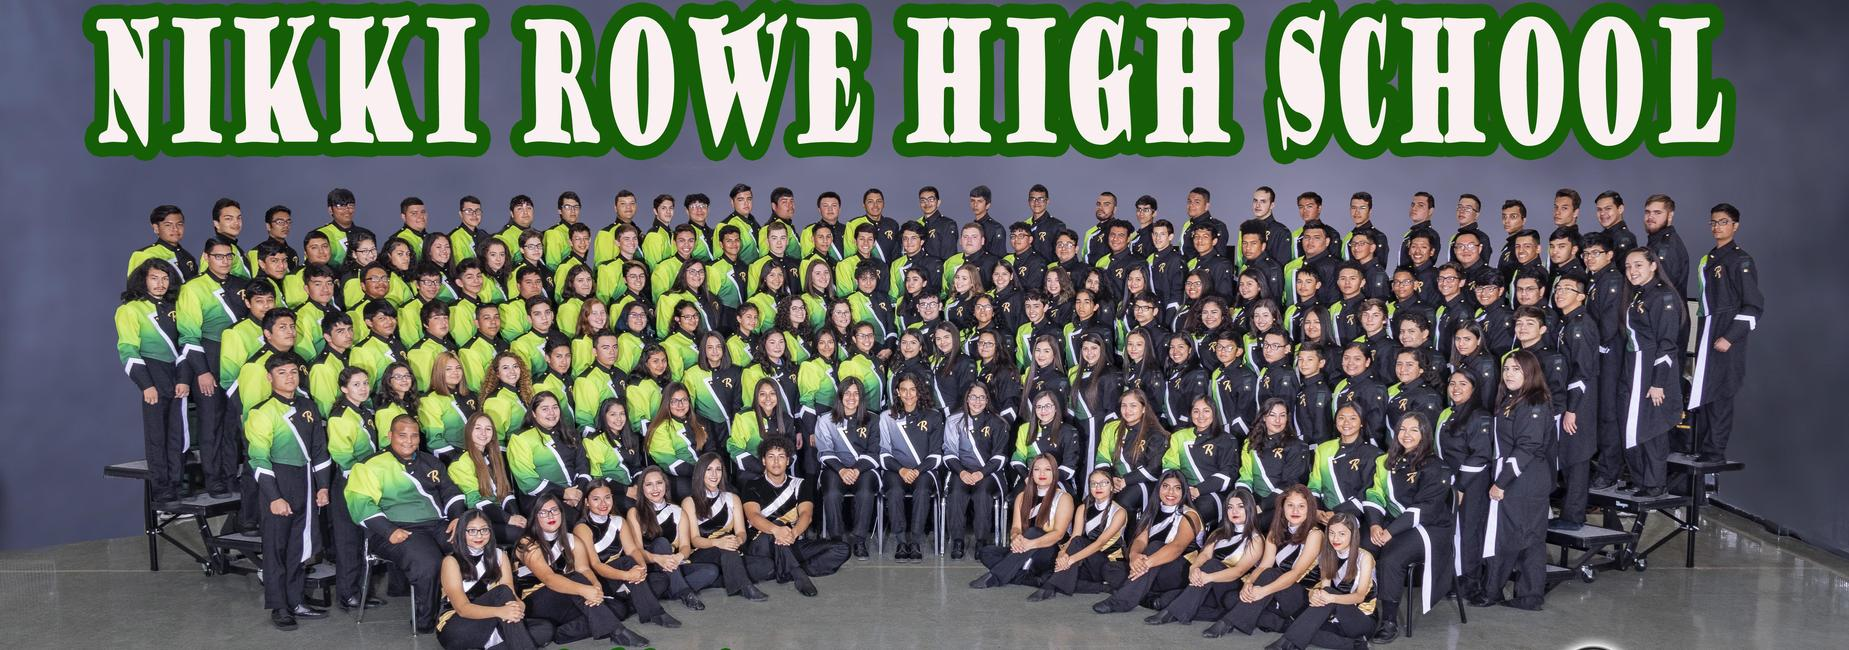 2018-2019 Nikki Rowe High School Warrior Band